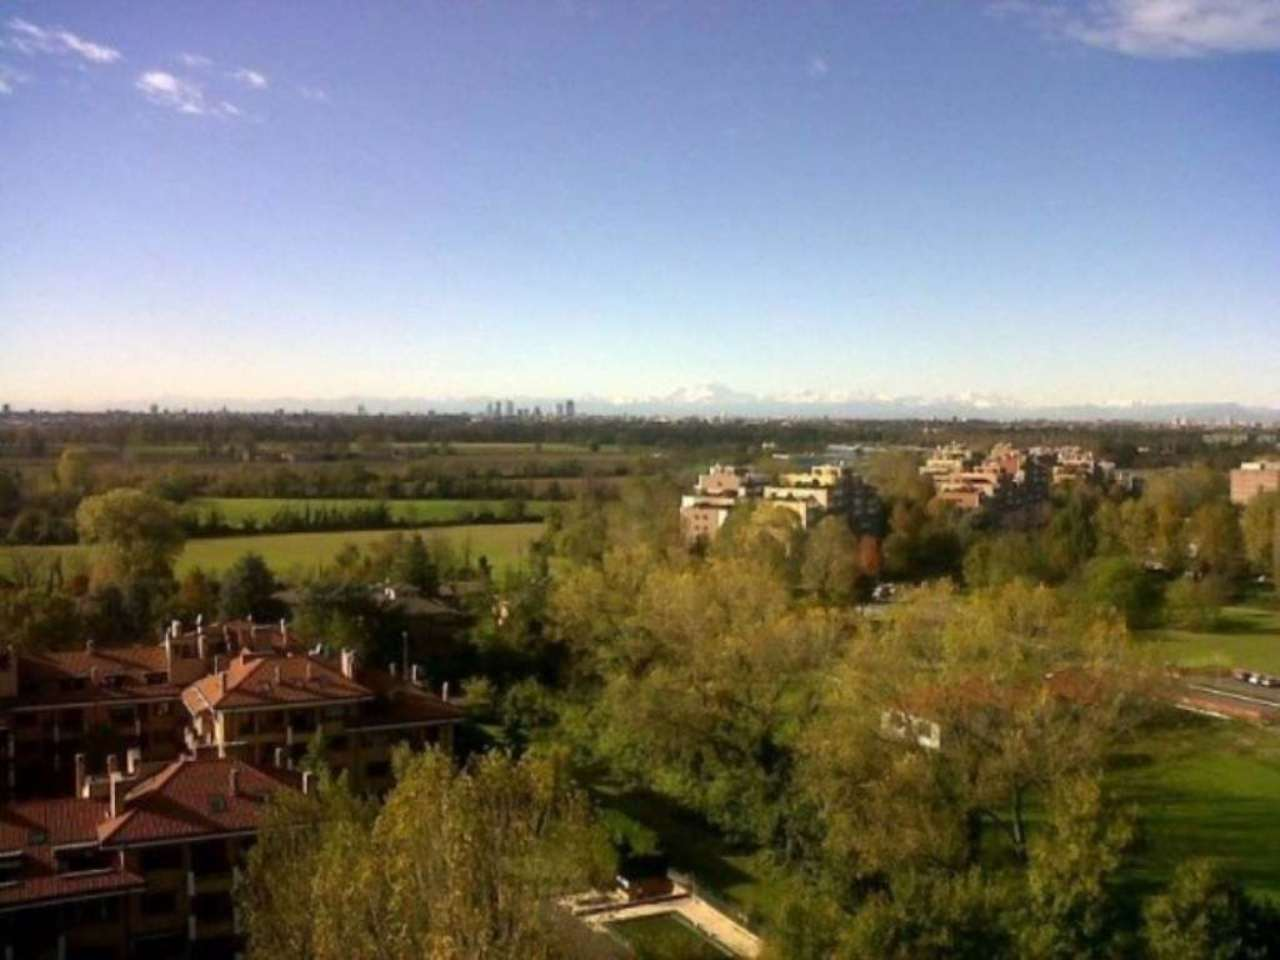 Bilocale Peschiera Borromeo Via Umbria 7